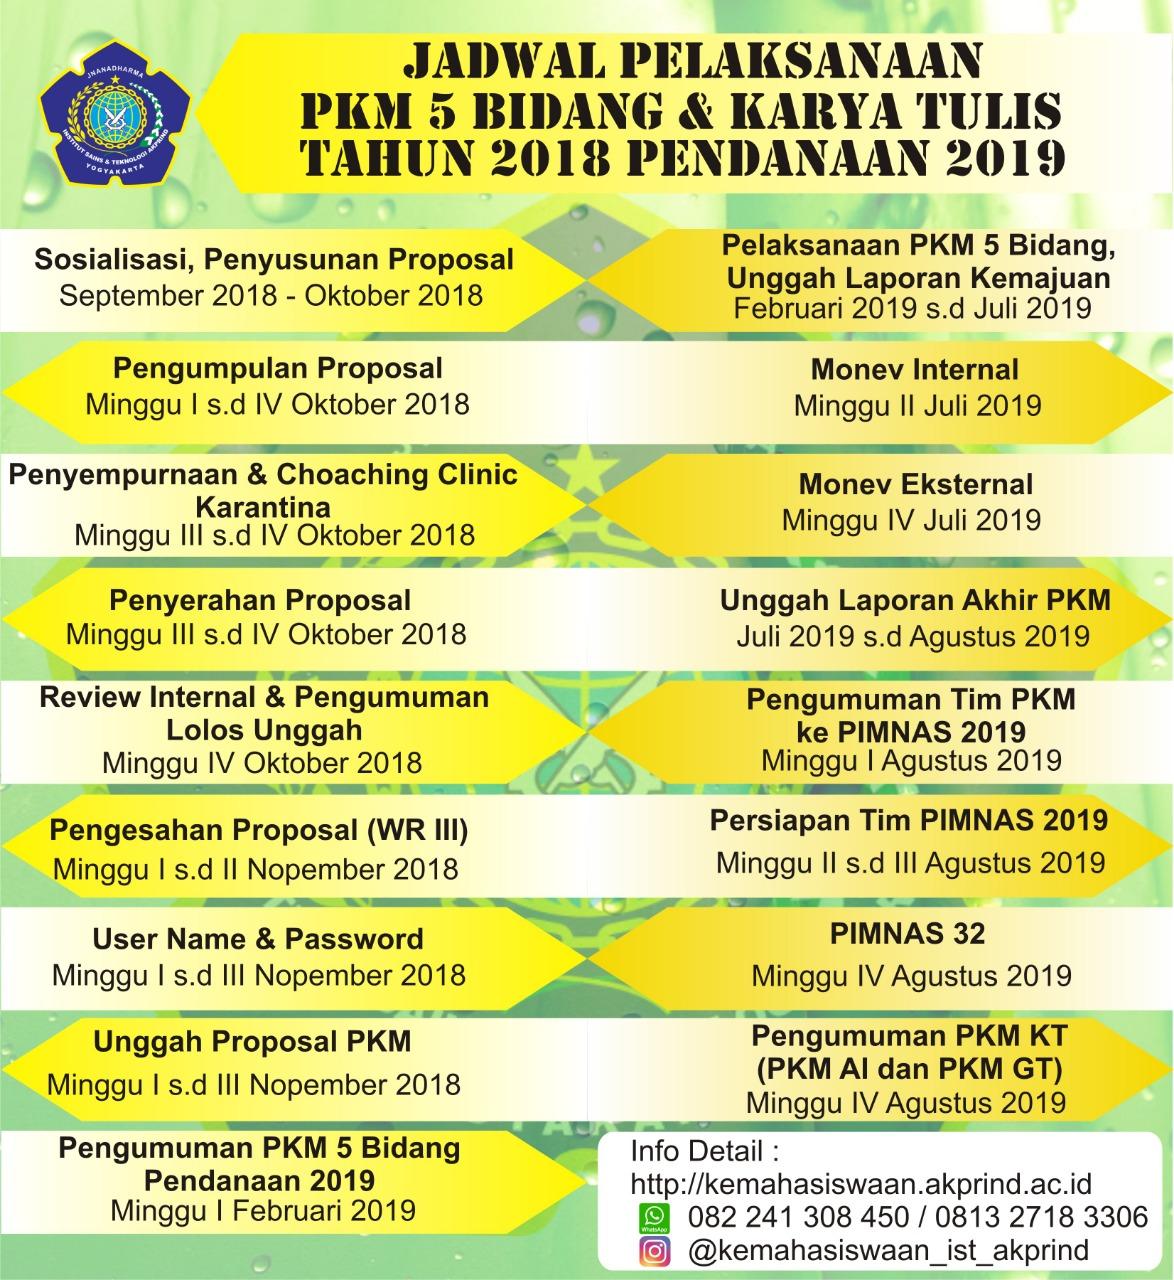 Jadwal PKM 5 Bidang